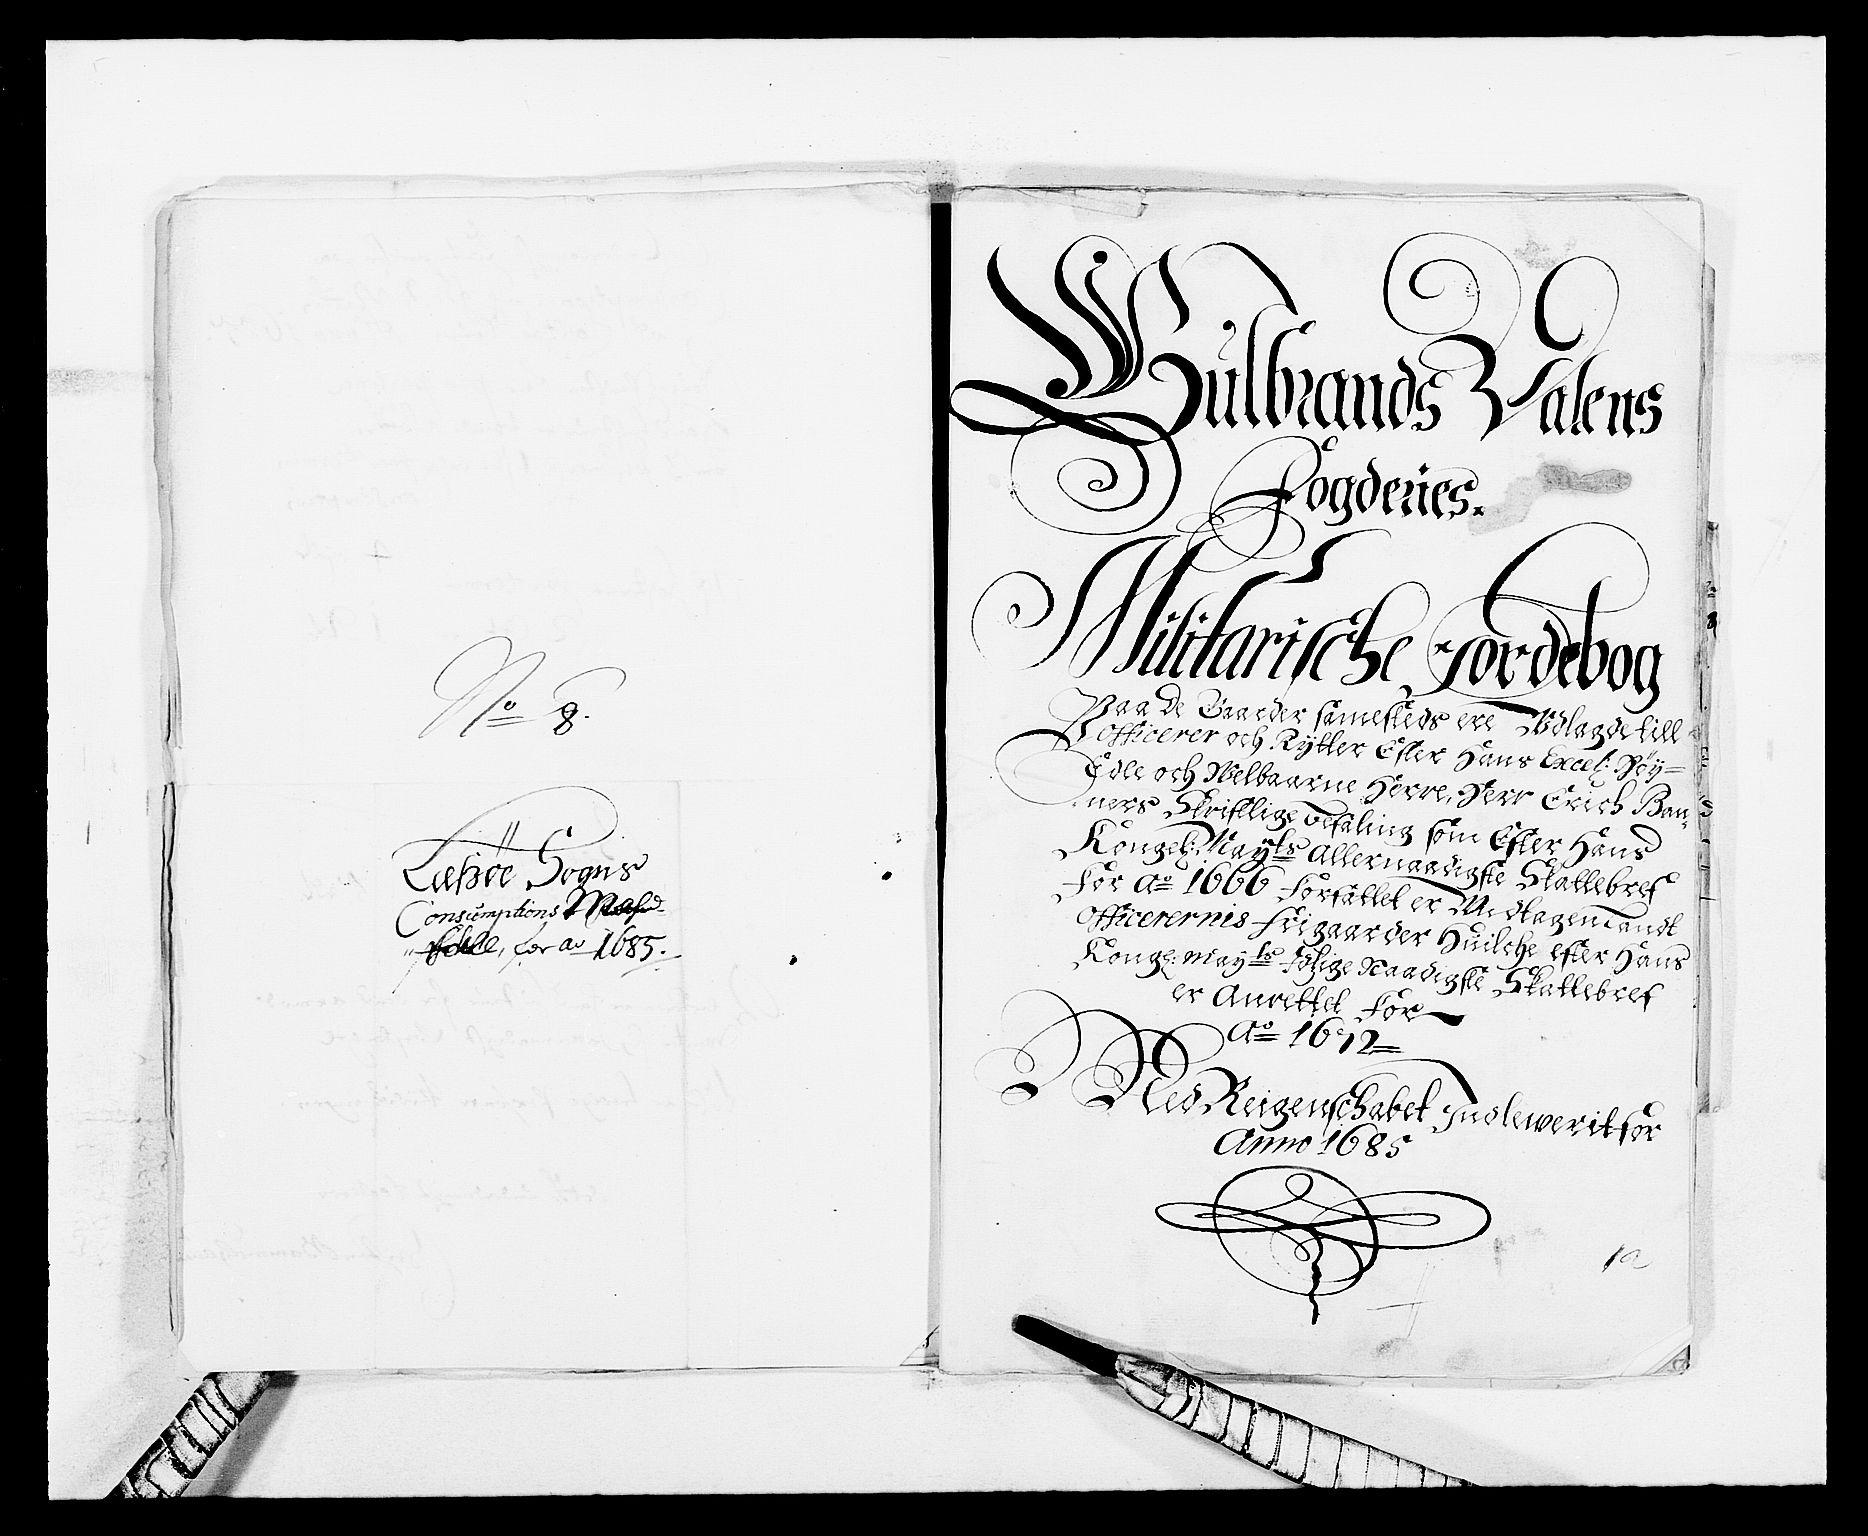 RA, Rentekammeret inntil 1814, Reviderte regnskaper, Fogderegnskap, R17/L1160: Fogderegnskap Gudbrandsdal, 1682-1689, s. 279